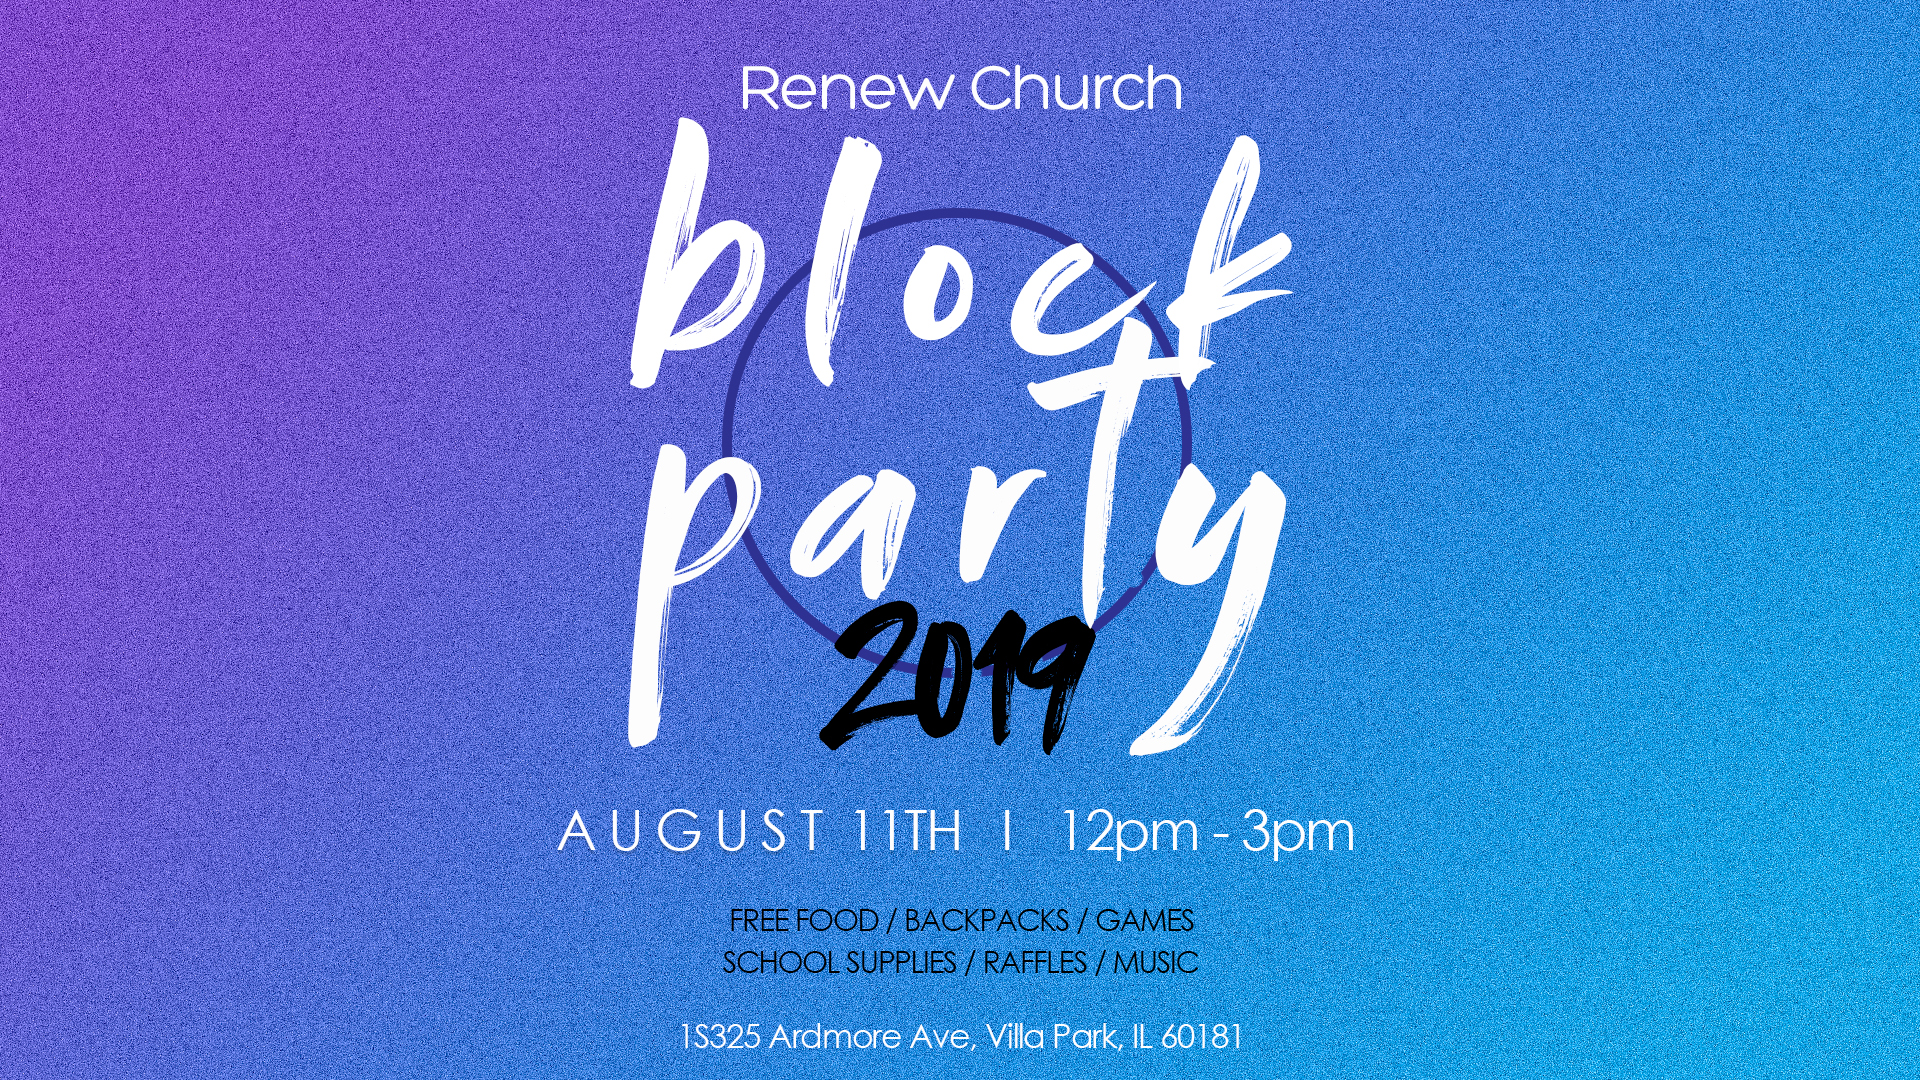 BlockParty2019_RenewChurch_v2.jpg